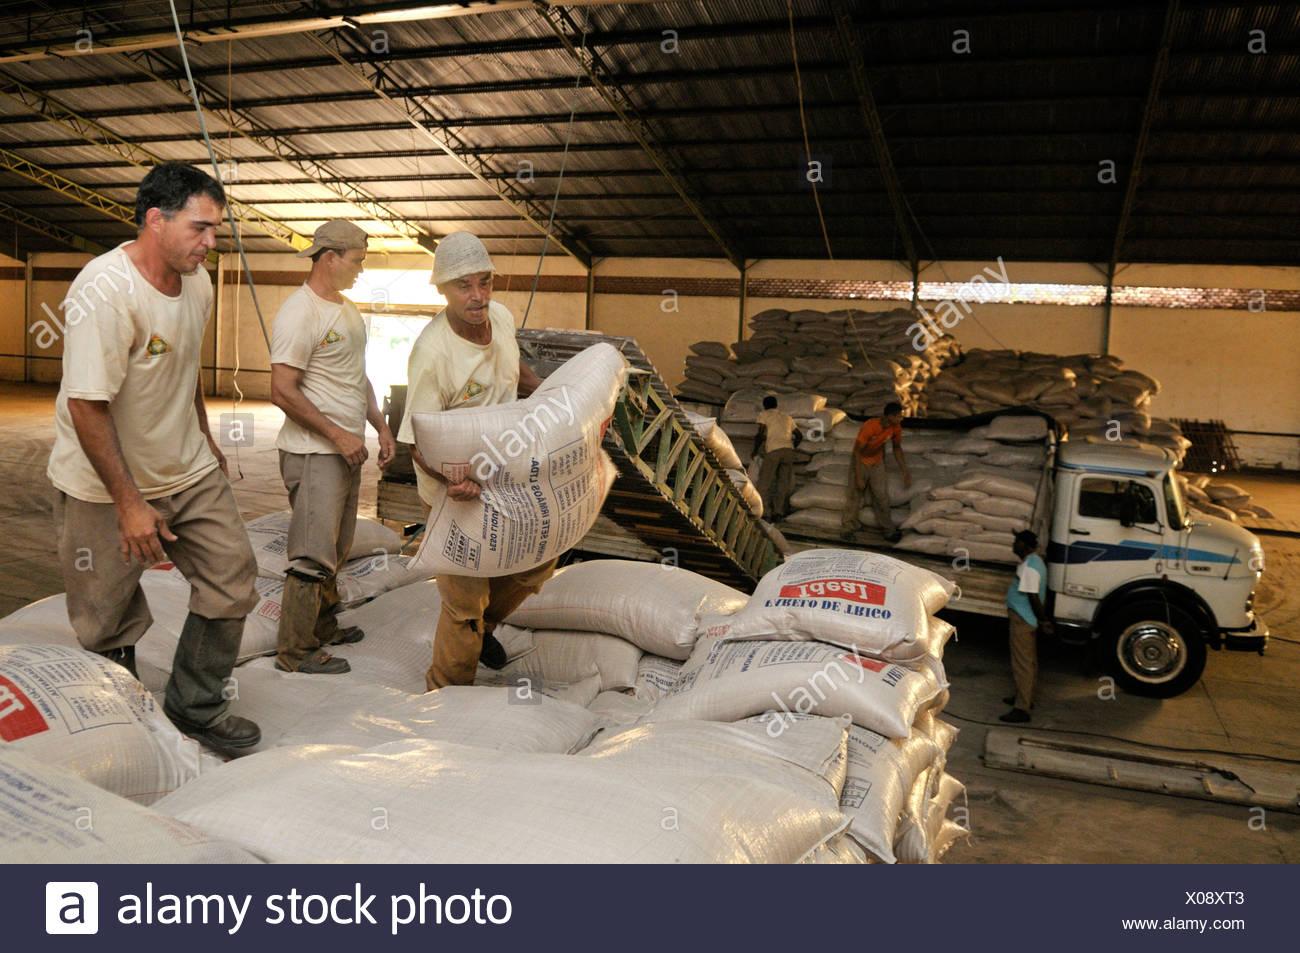 Unloading sacks of grain in a warehouse, Uberlandia, Minas Gerais, Brazil, South America - Stock Image